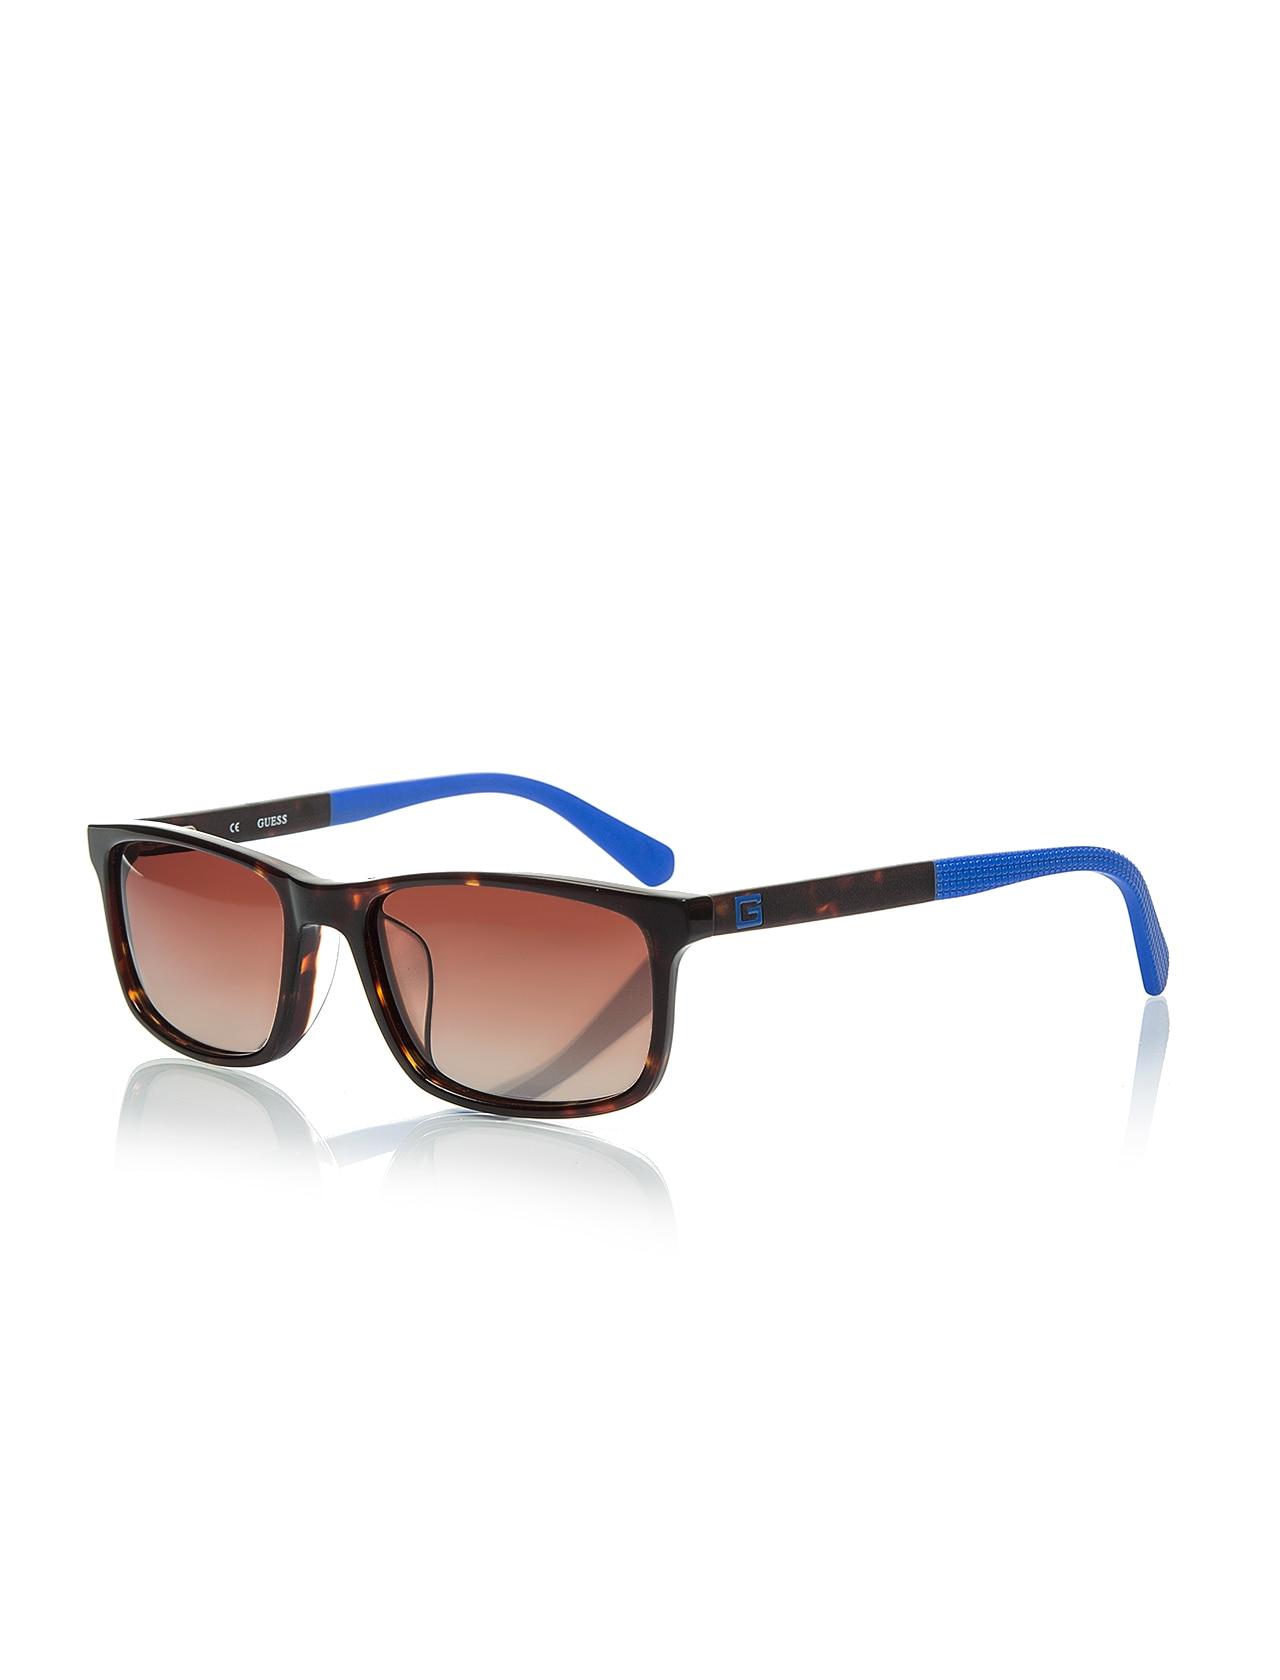 Unisex sunglasses gu 1878 052 bone Brown unspecified 53-guess